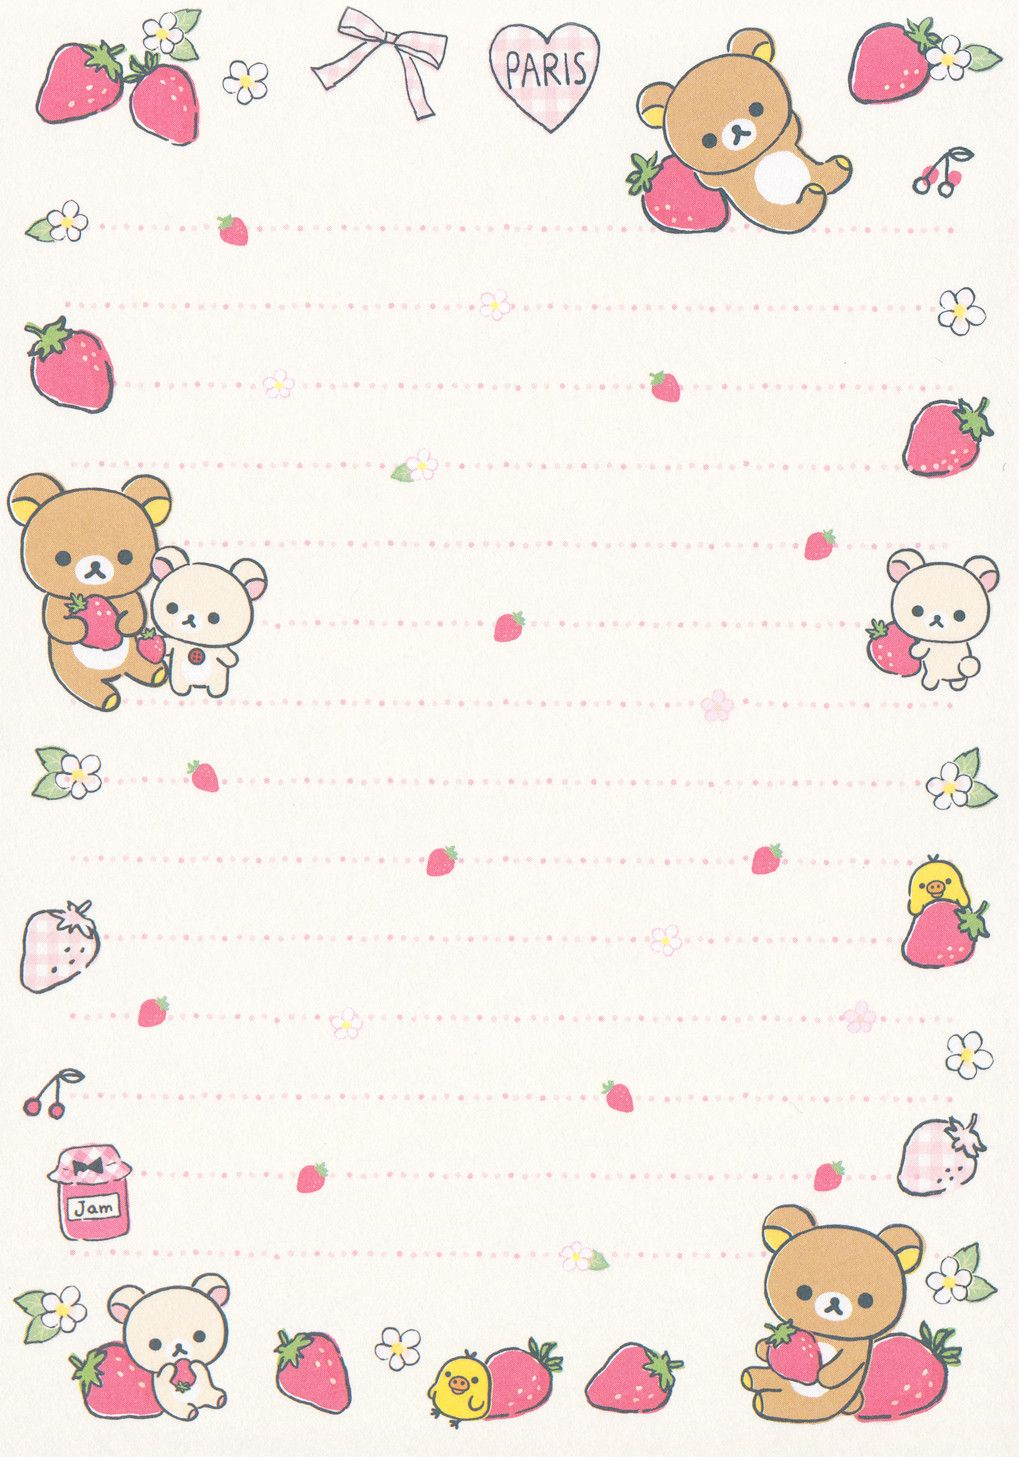 San X Rilakkuma La Fraise Memo Crazysugarbunny Flickr Printable Scrapbook Paper Kawaii Printables Stationery Paper